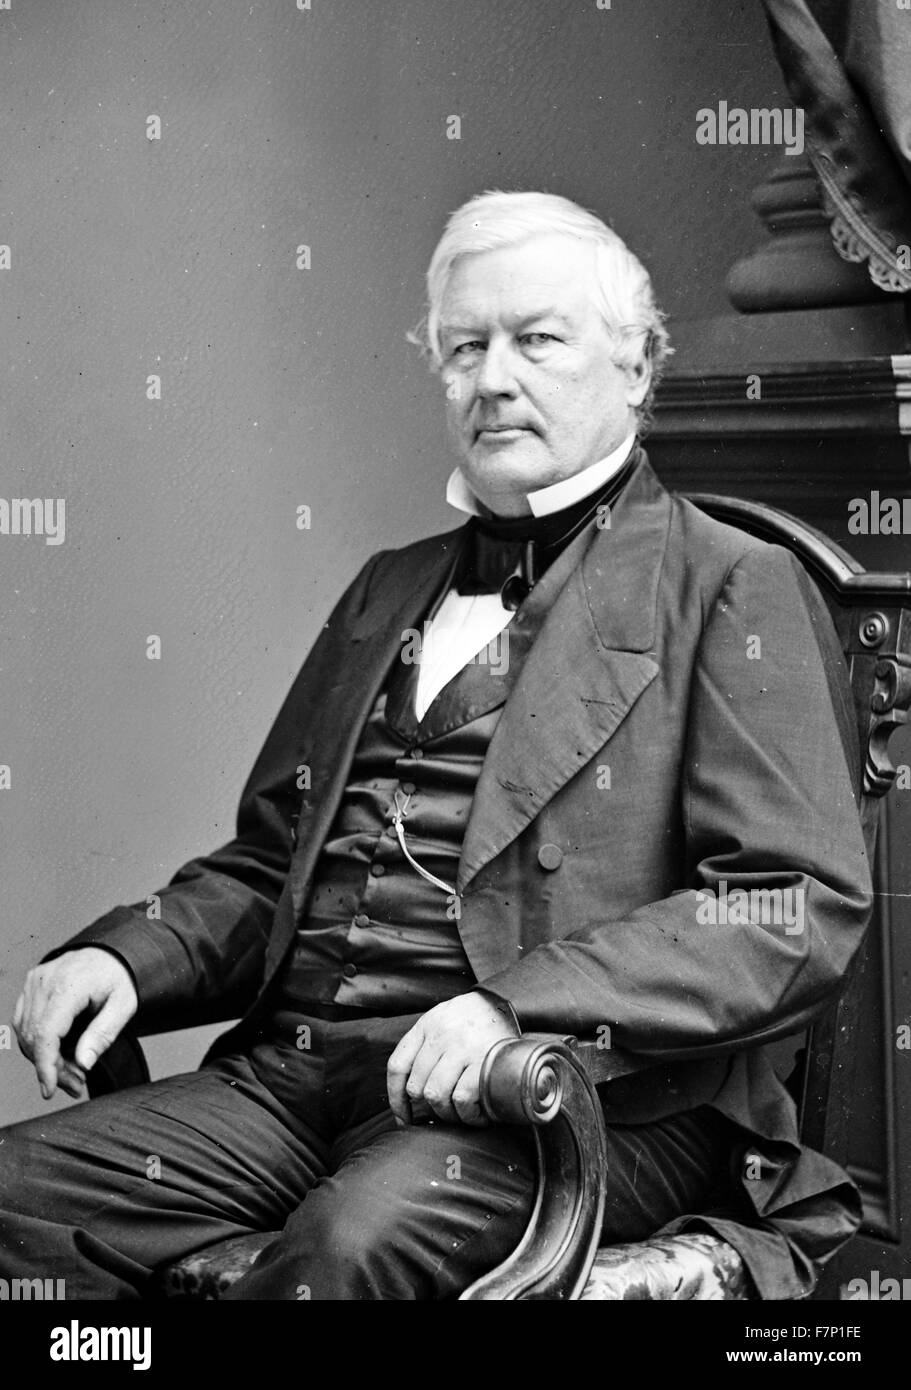 President Millard Fillmore 1860. Millard Fillmore (January 7, 1800 – March 8, 1874) was the 13th President of the Stock Photo